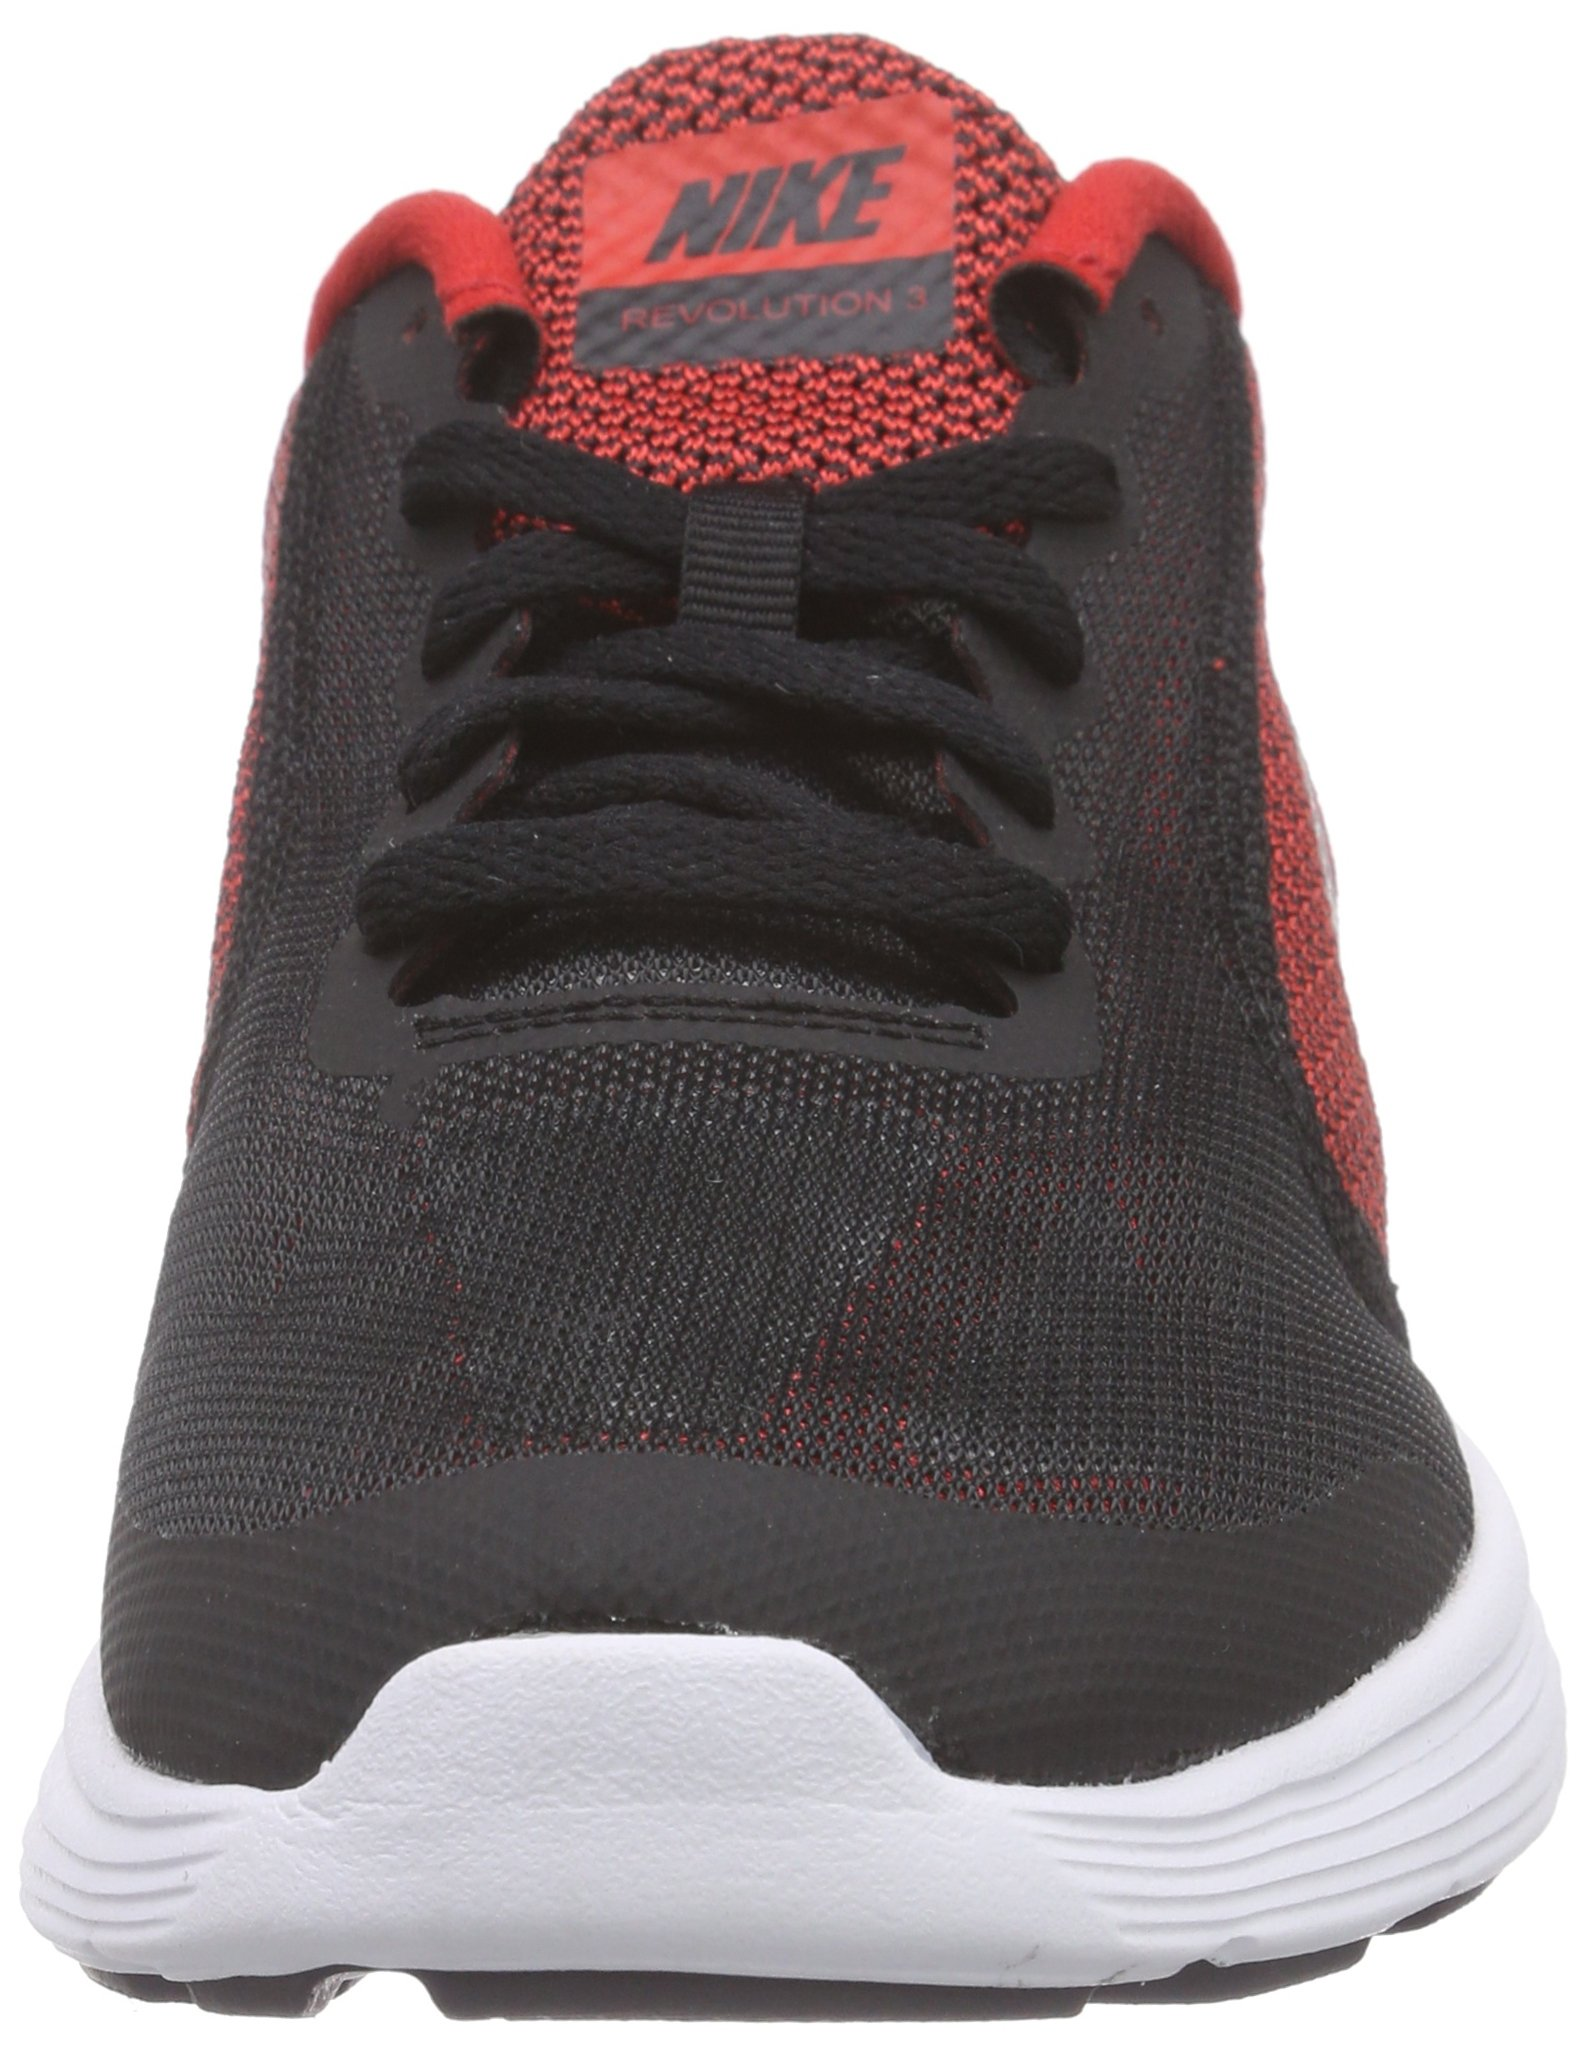 NIKE Boys' Revolution 3 Running Shoe (GS), University Red/Metallic Silver/Black, 3.5 M US Big Kid by Nike (Image #4)